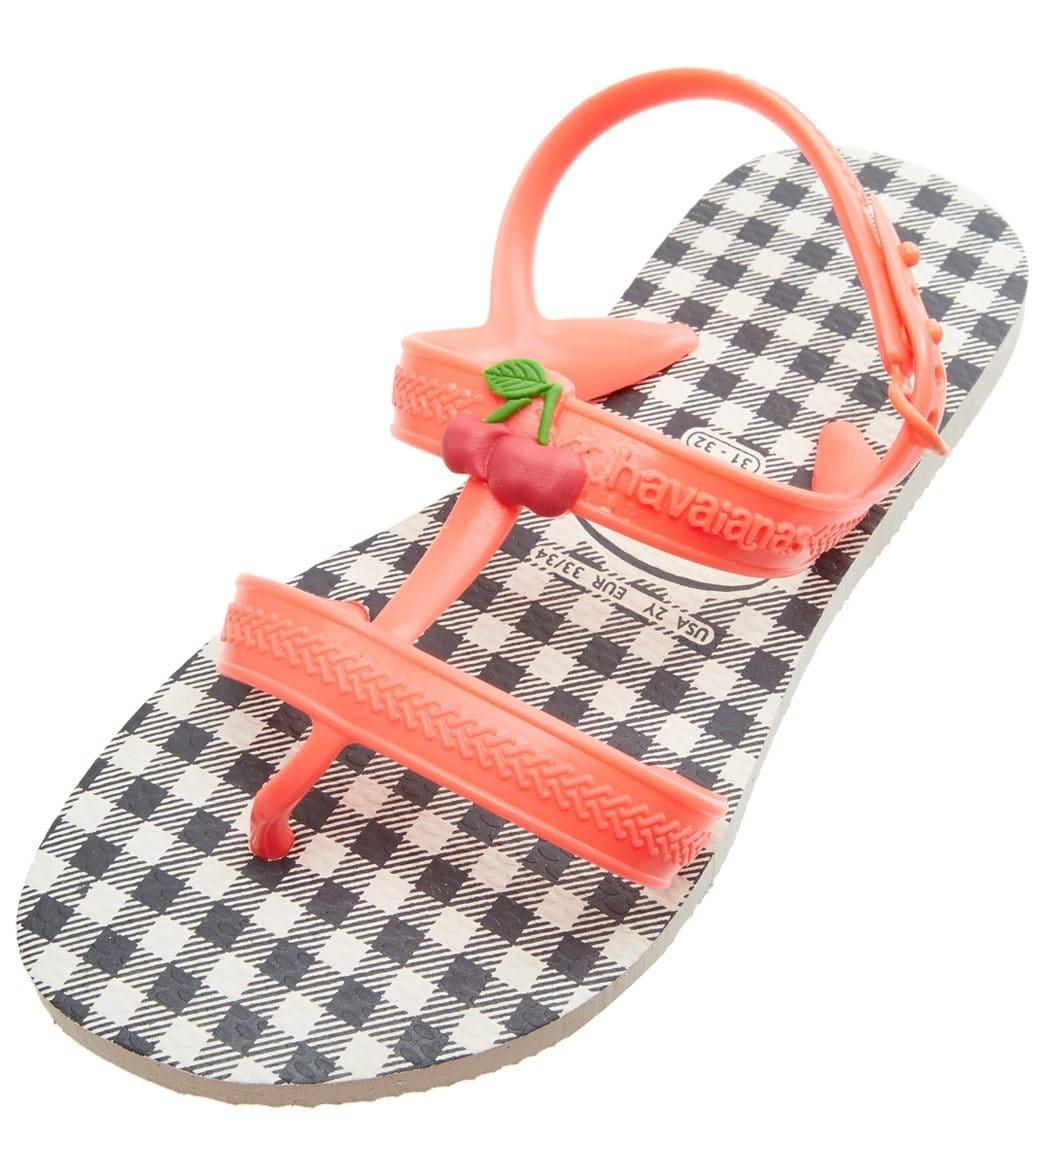 37277e9096a23 Havaianas Girls  Joy Spring Sandal (Toddler